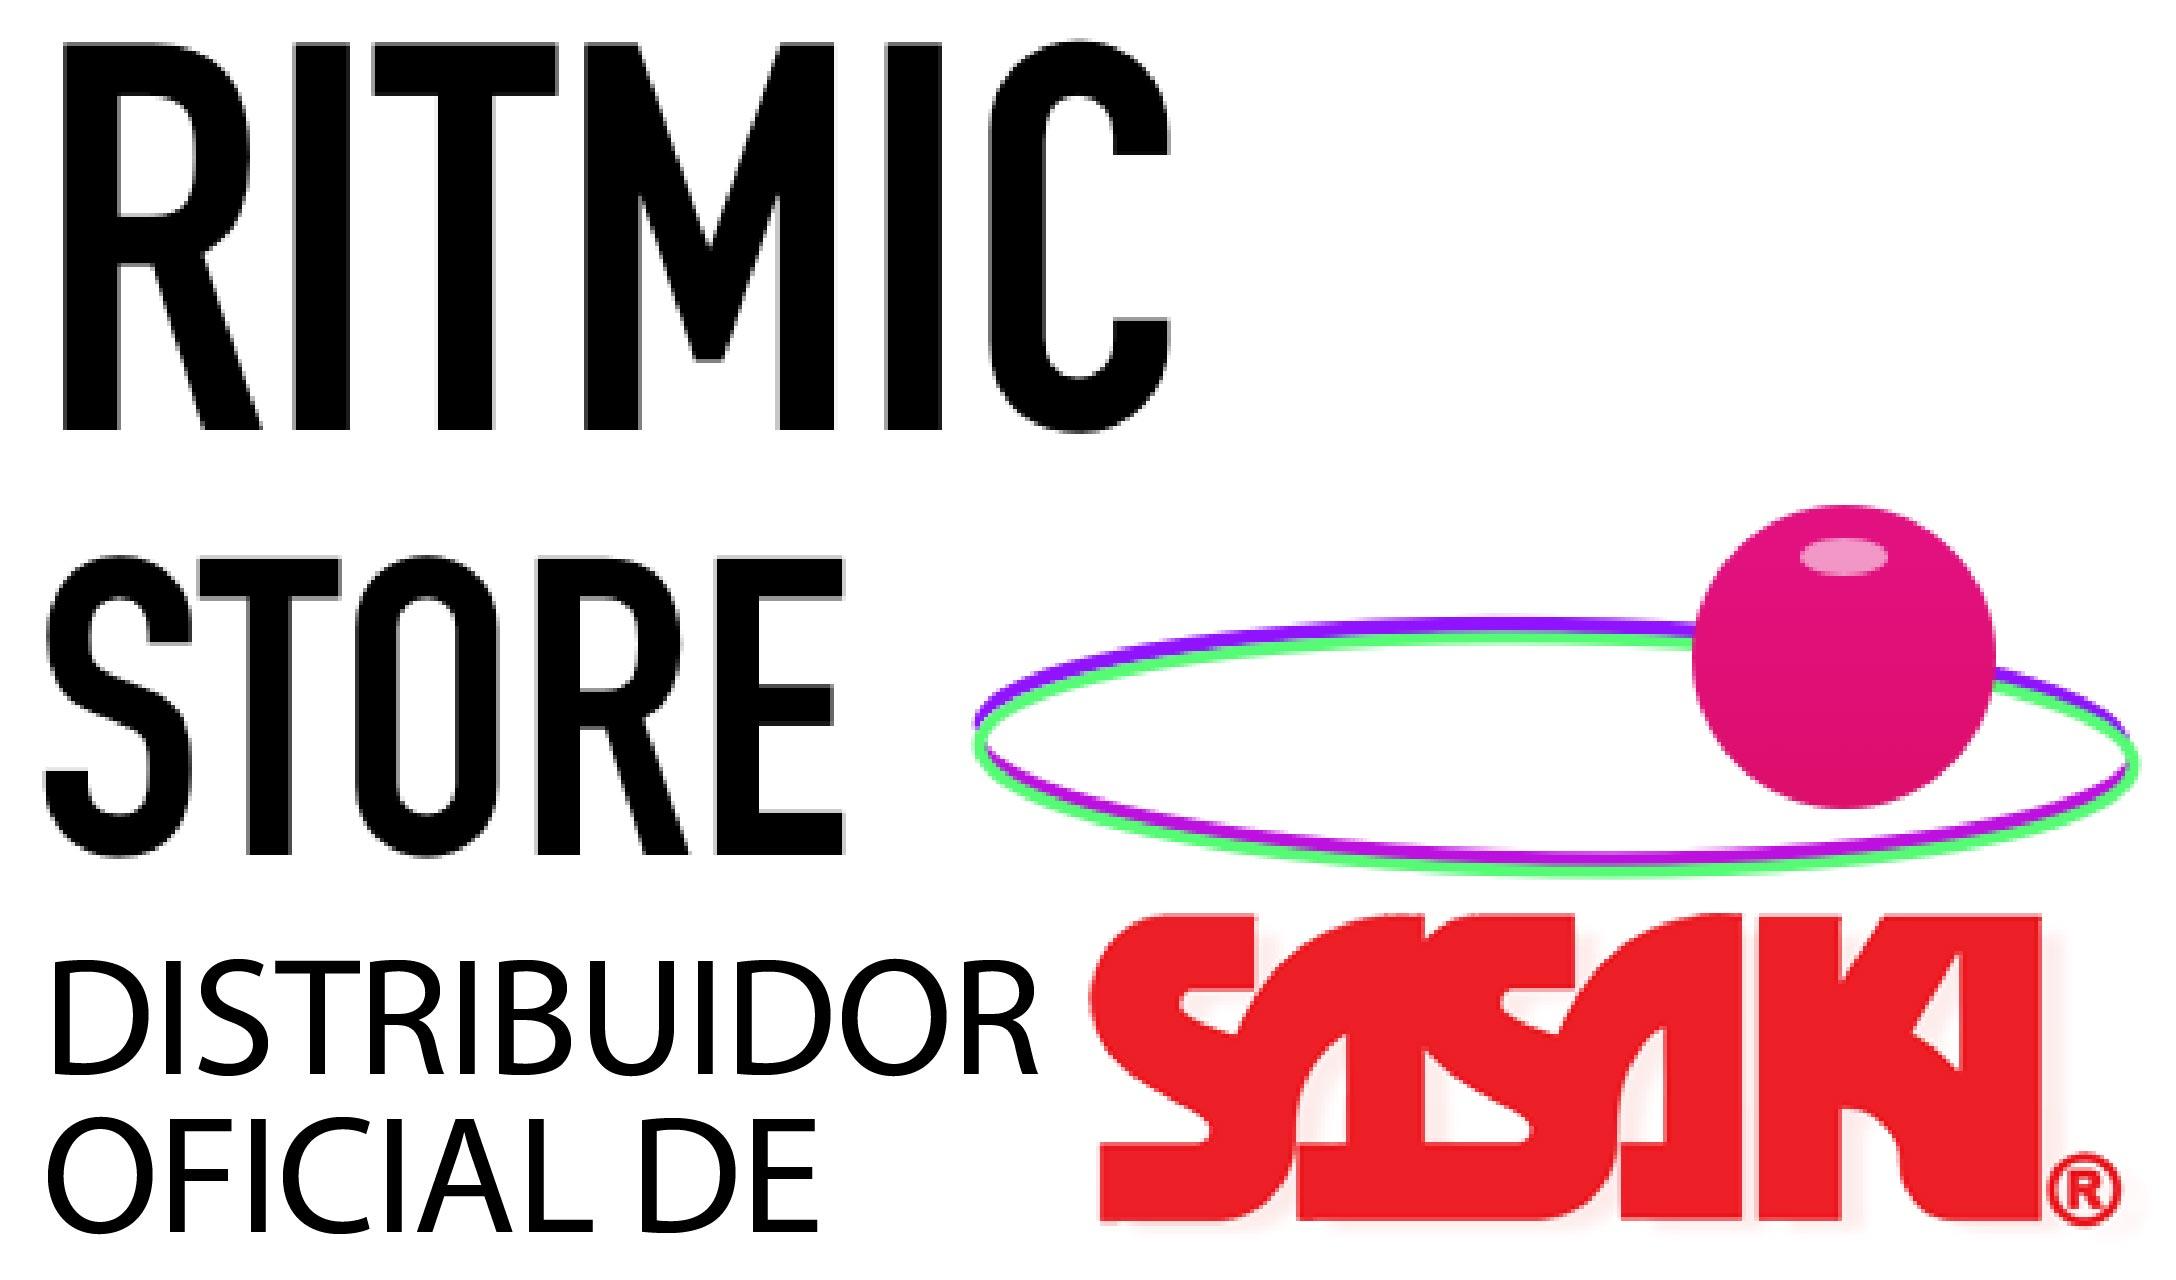 Ritmic Store